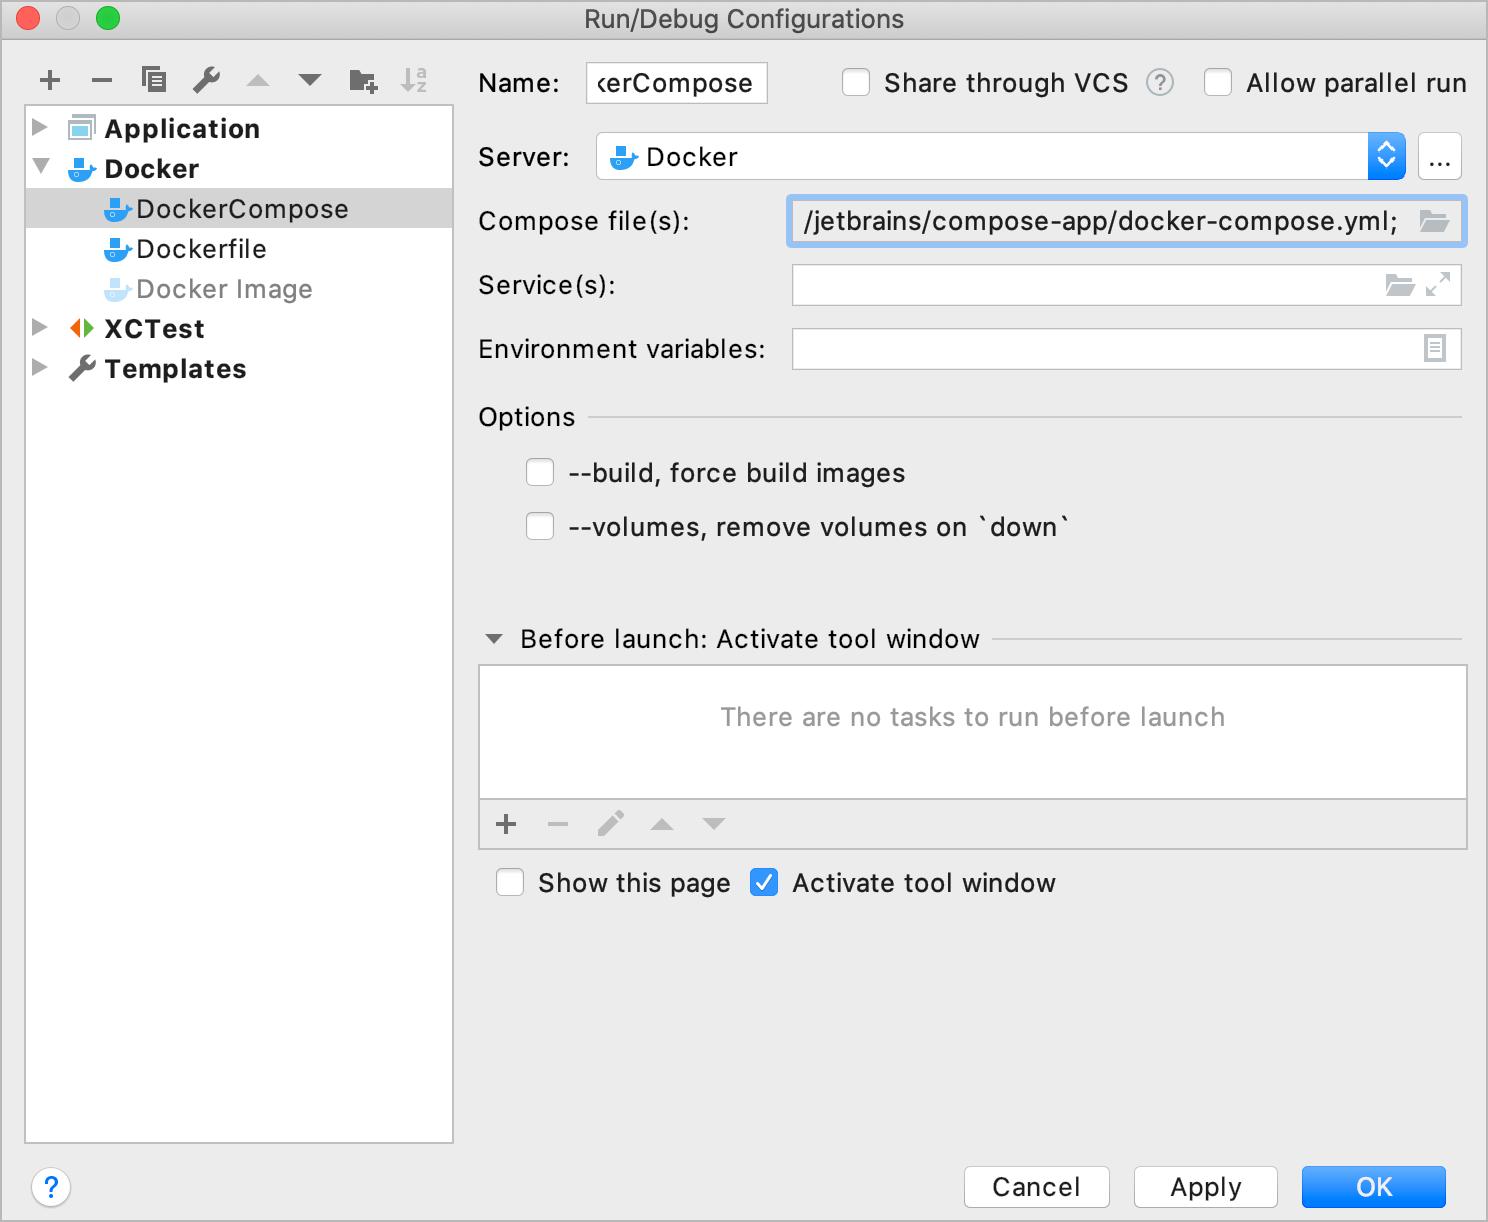 The Docker-compose configuration